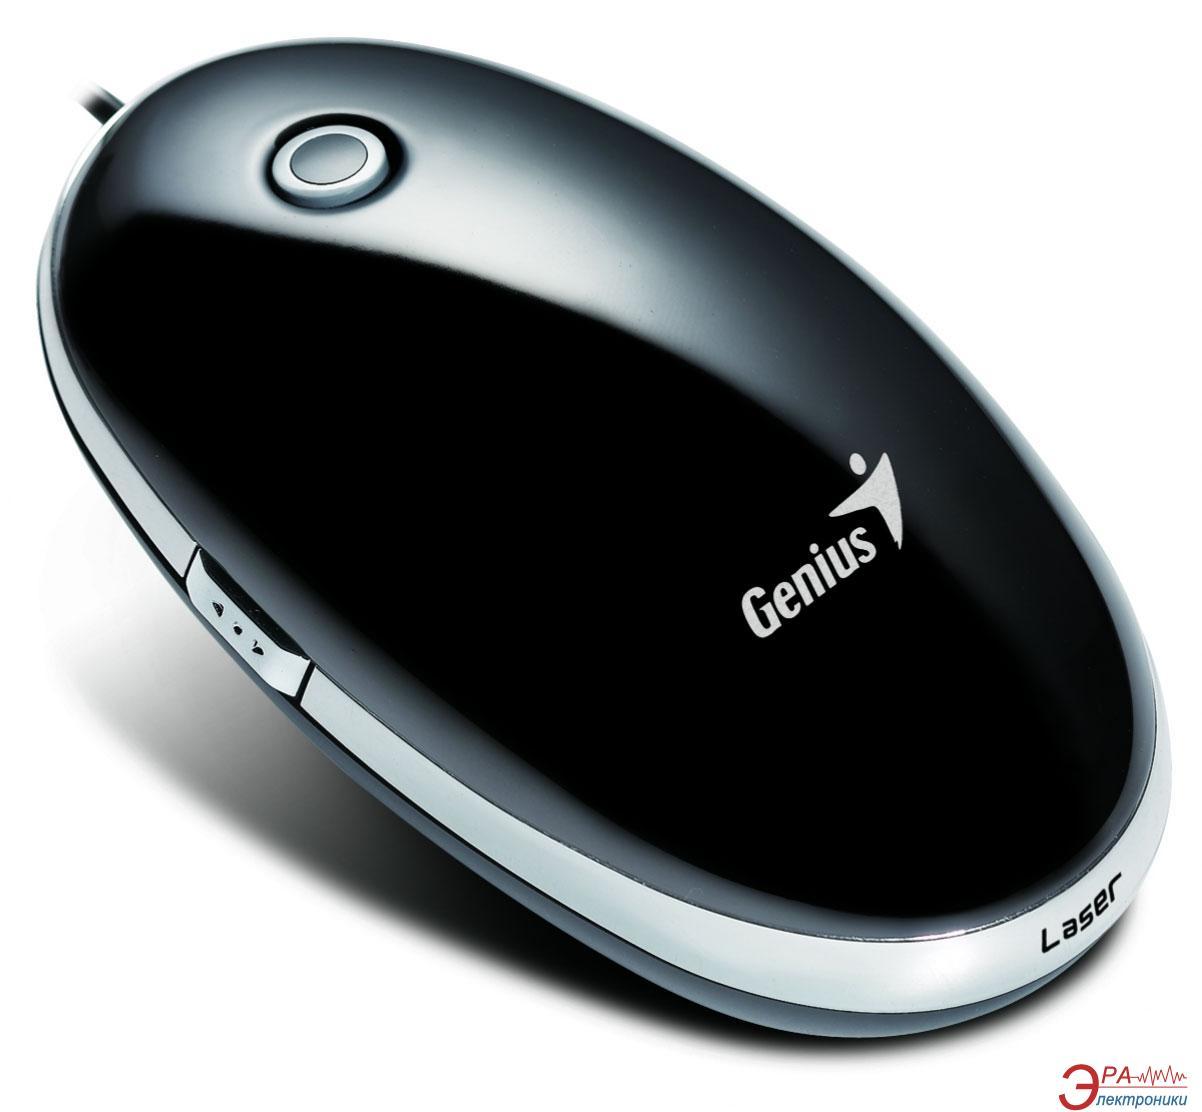 Мышь Genius ScrollToo T355 Laser USB (31010087101) Black